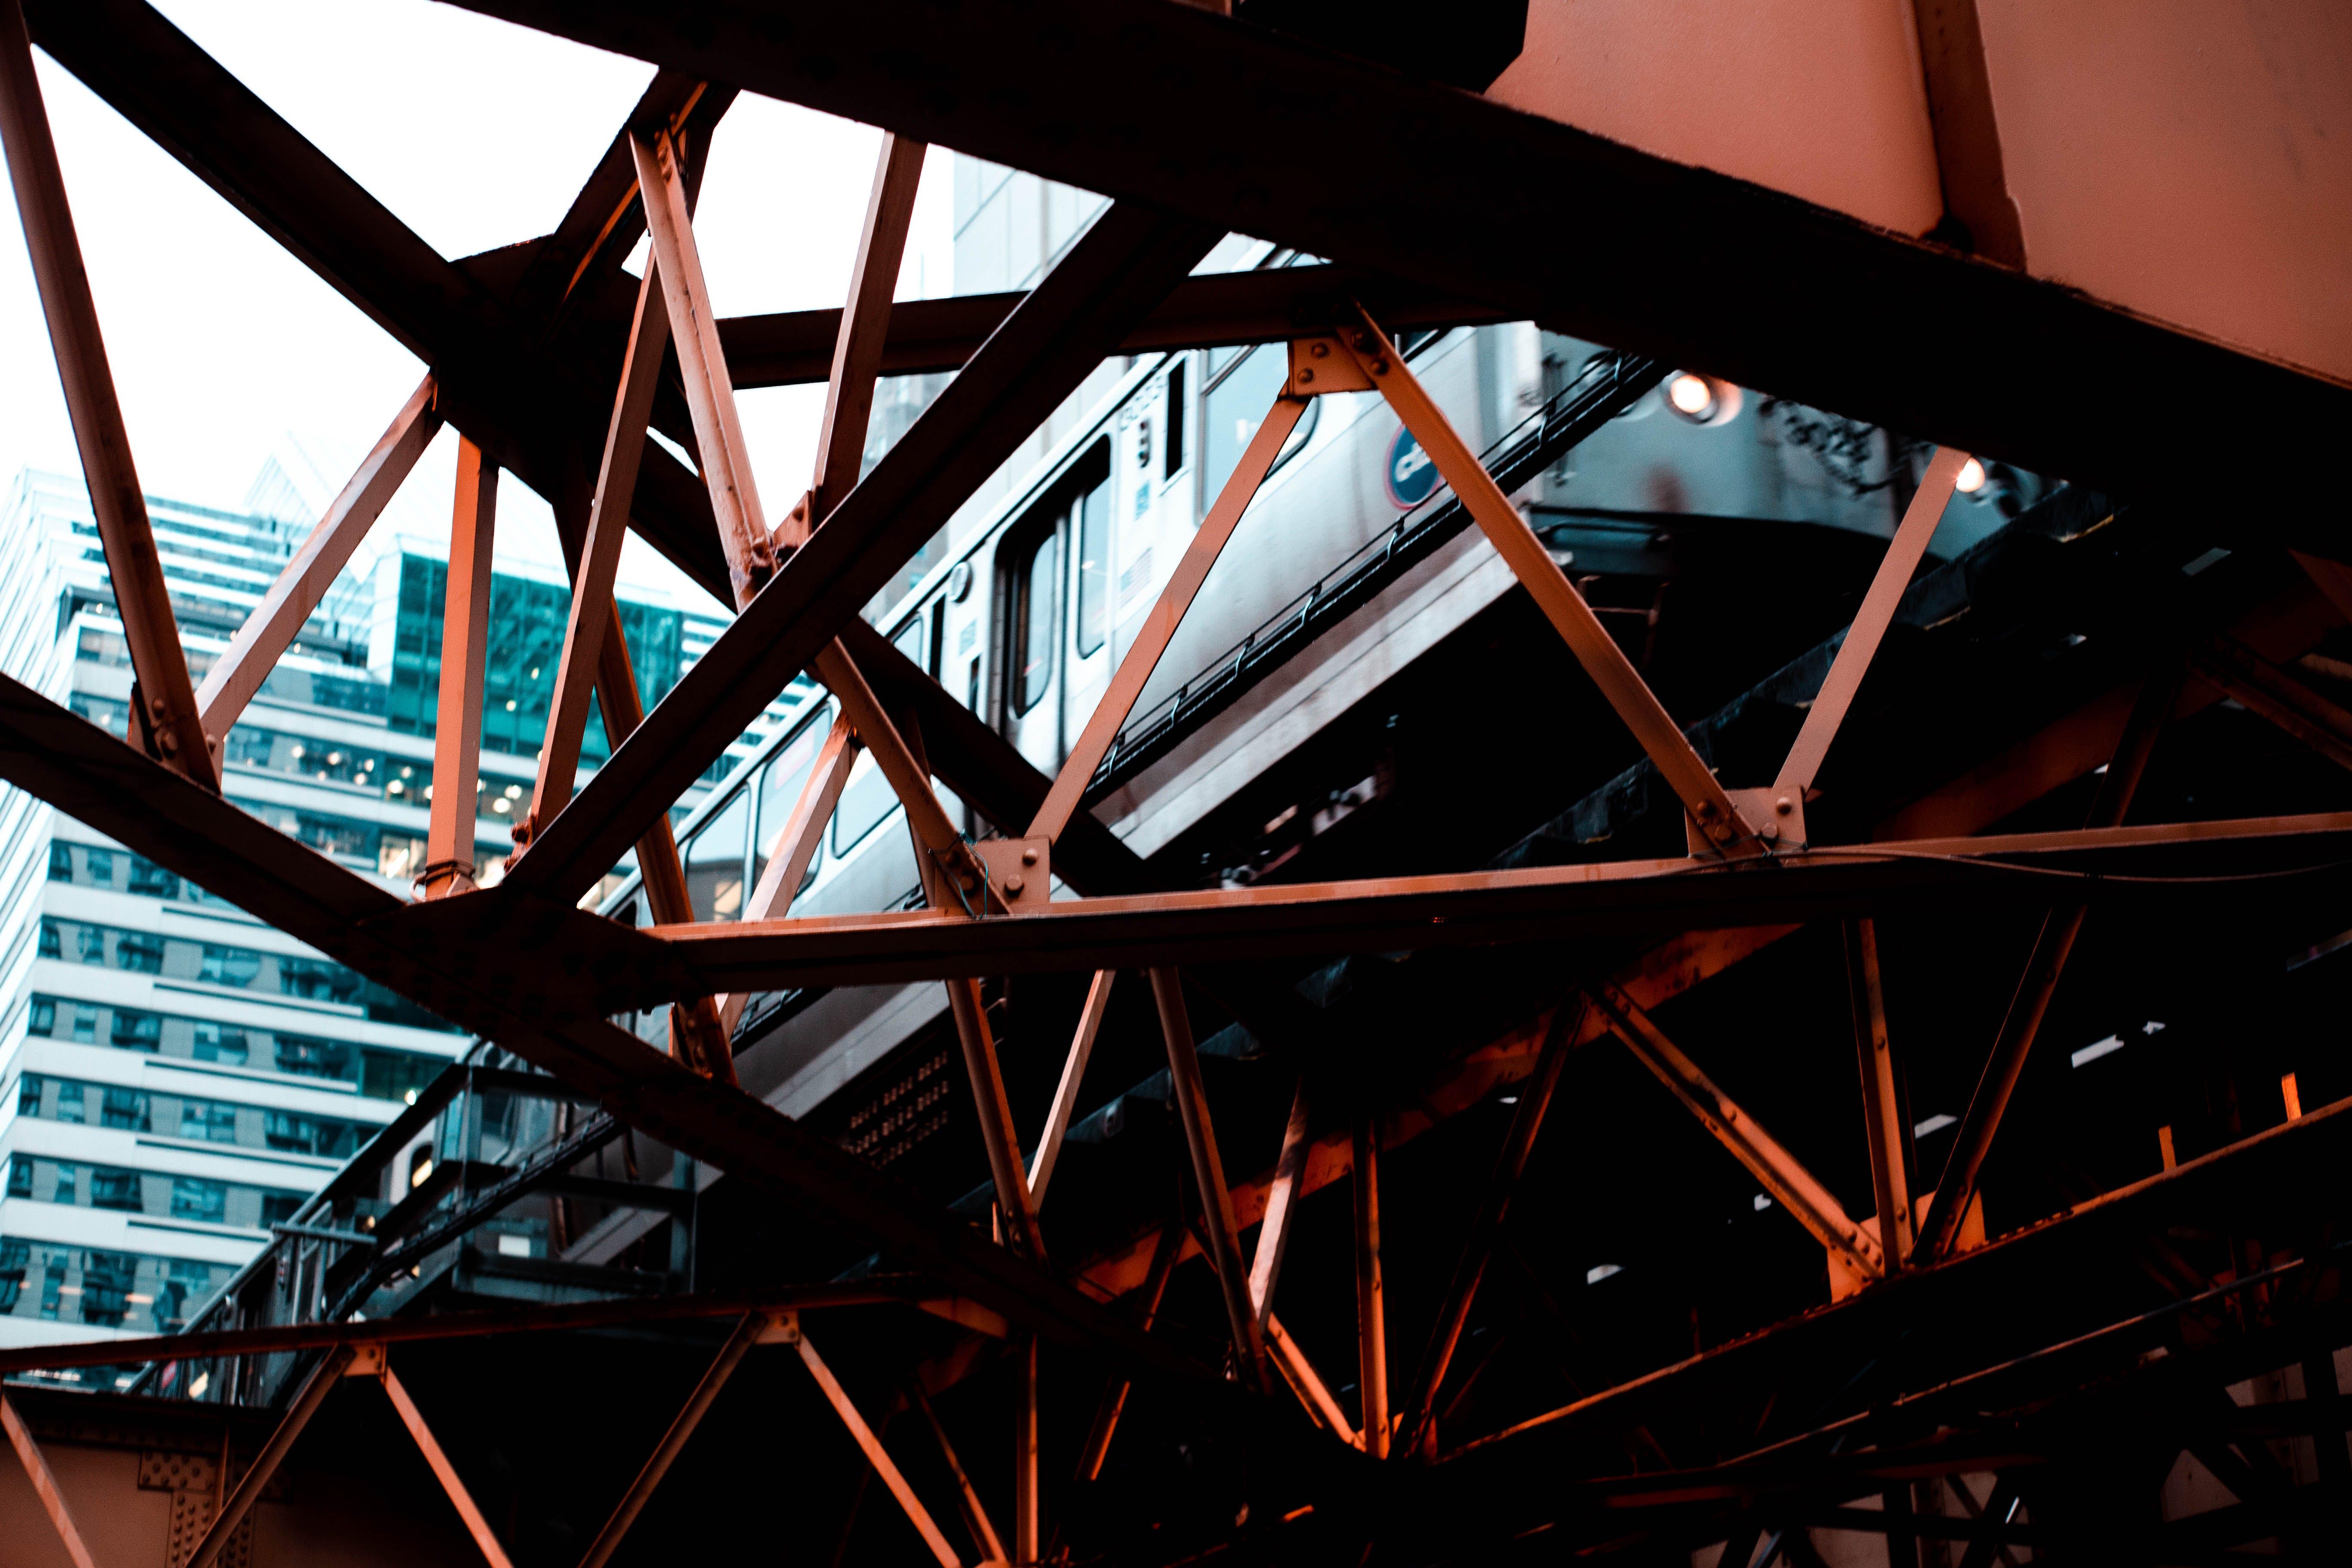 Low Angle Photo of Train on a Metal Bridge Beam